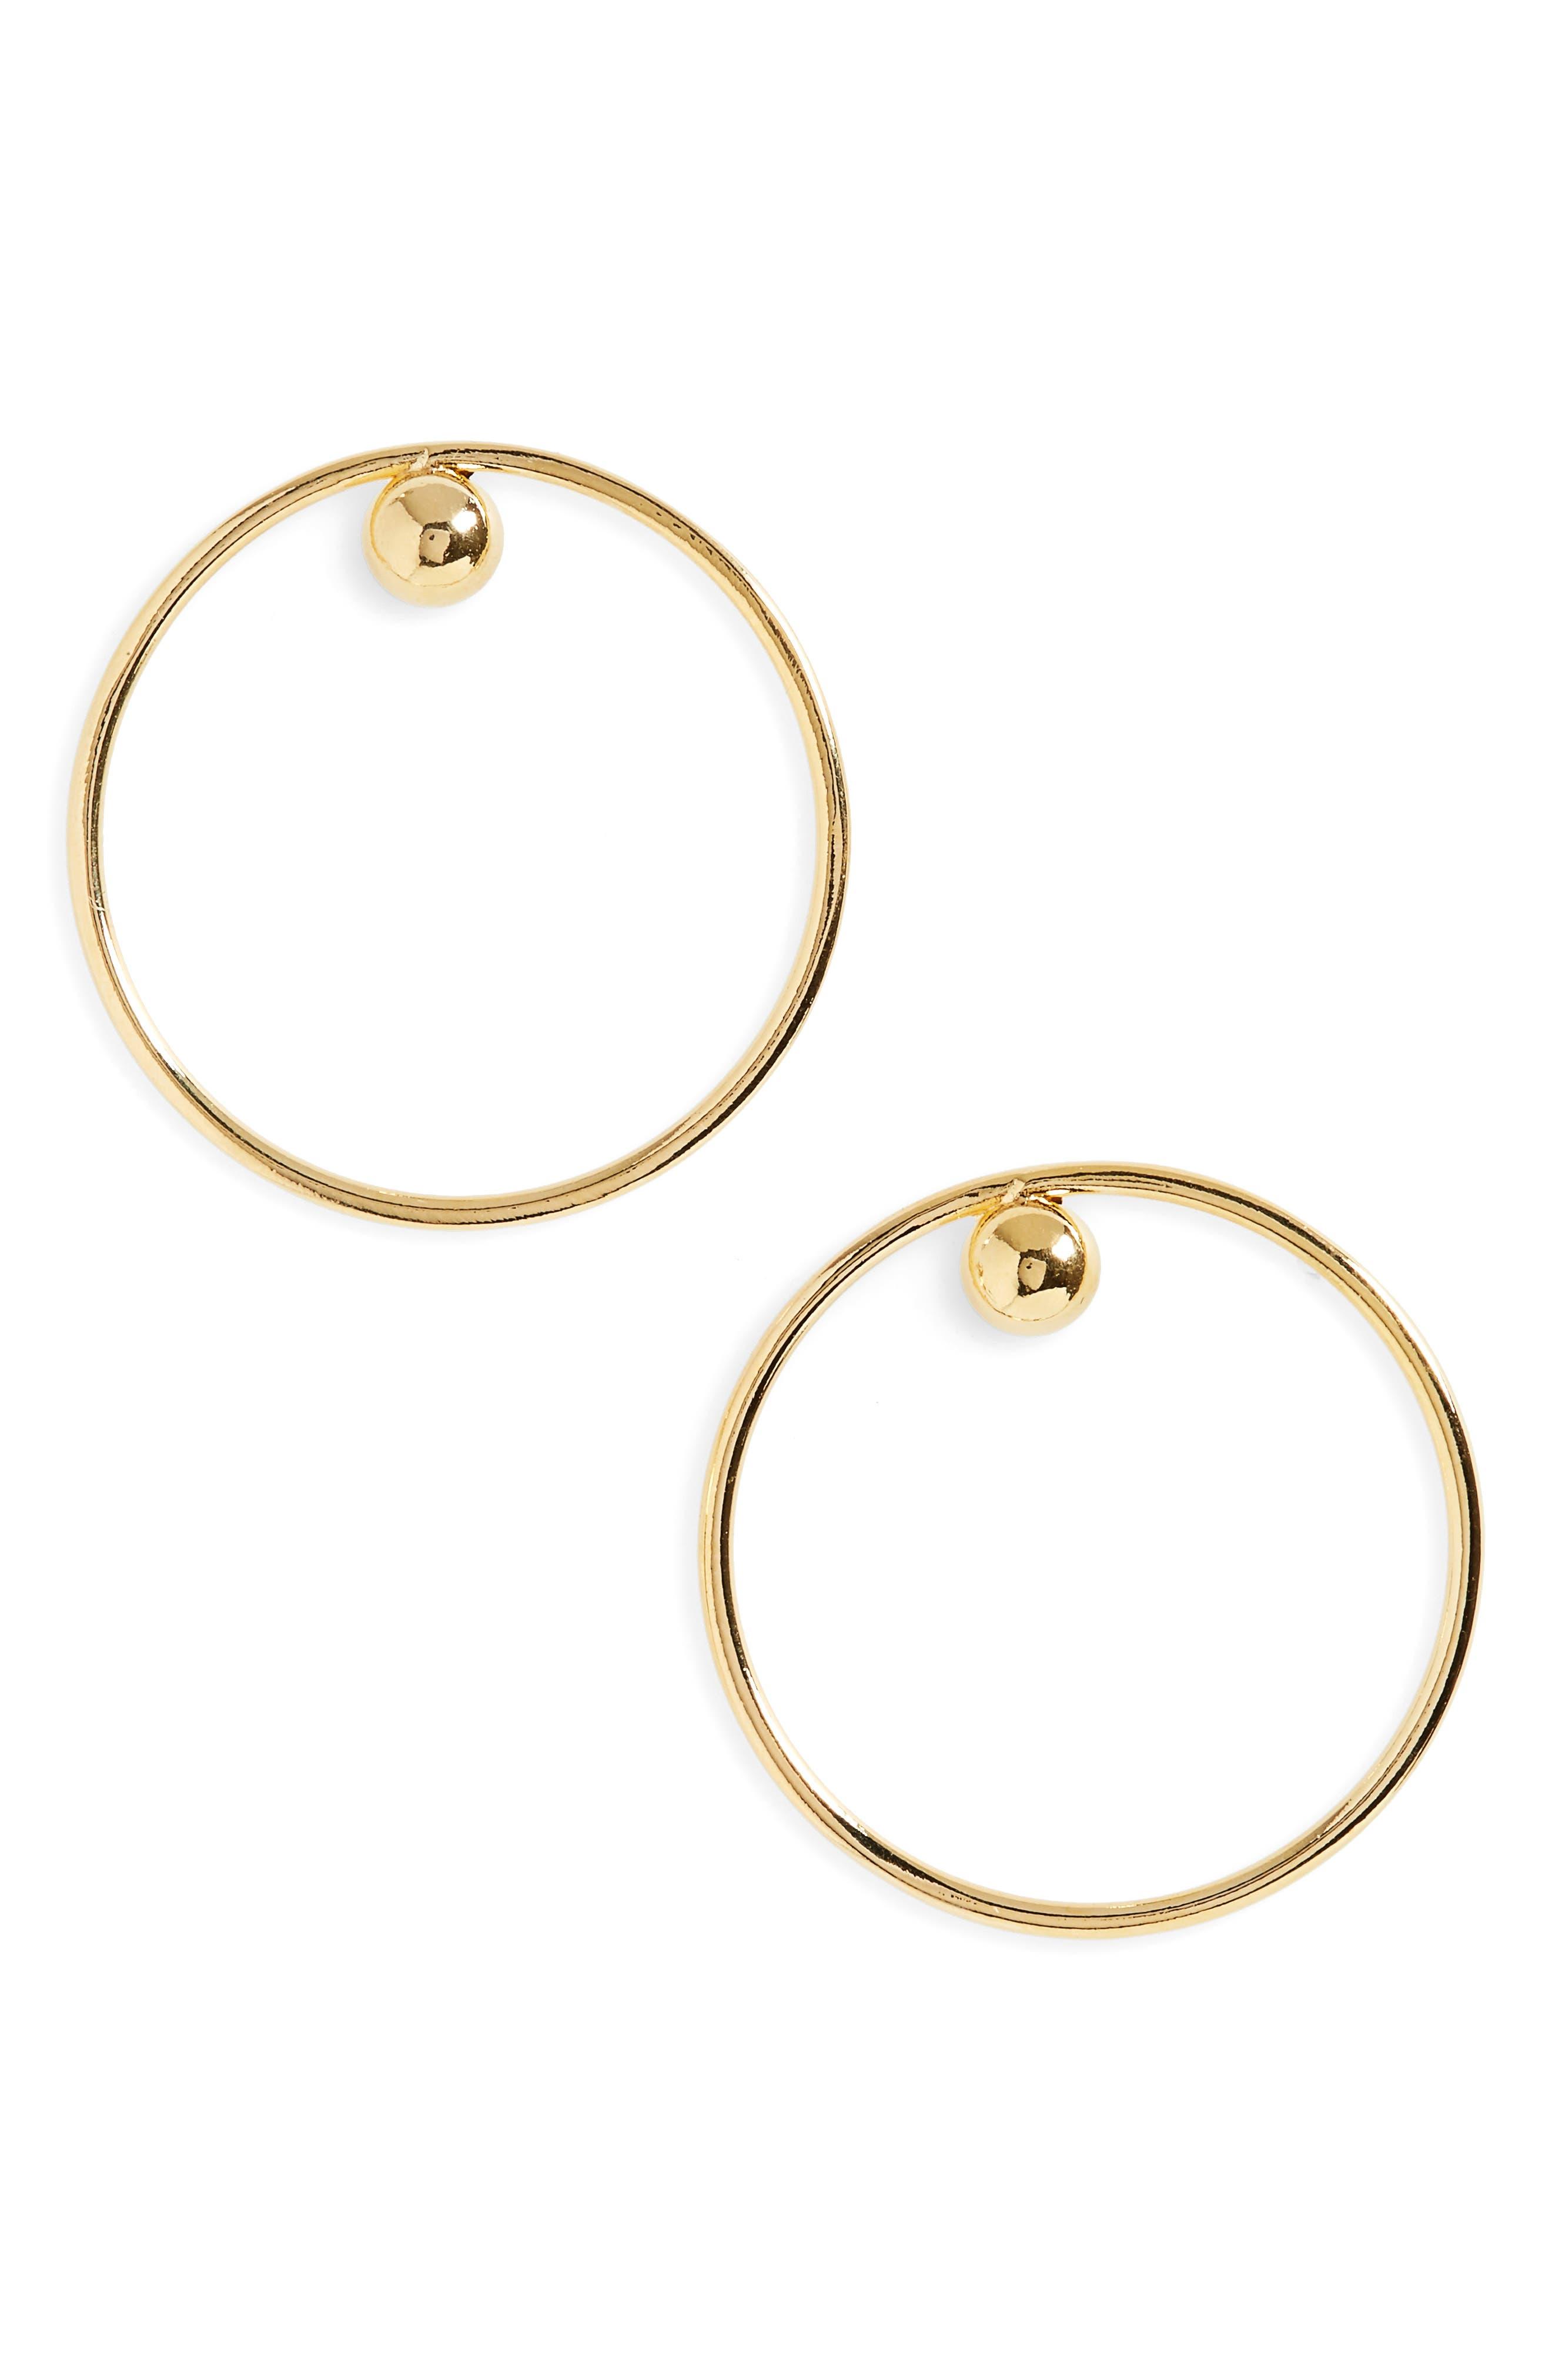 Main Image - BIKO Dot Frontal Hoop Earrings